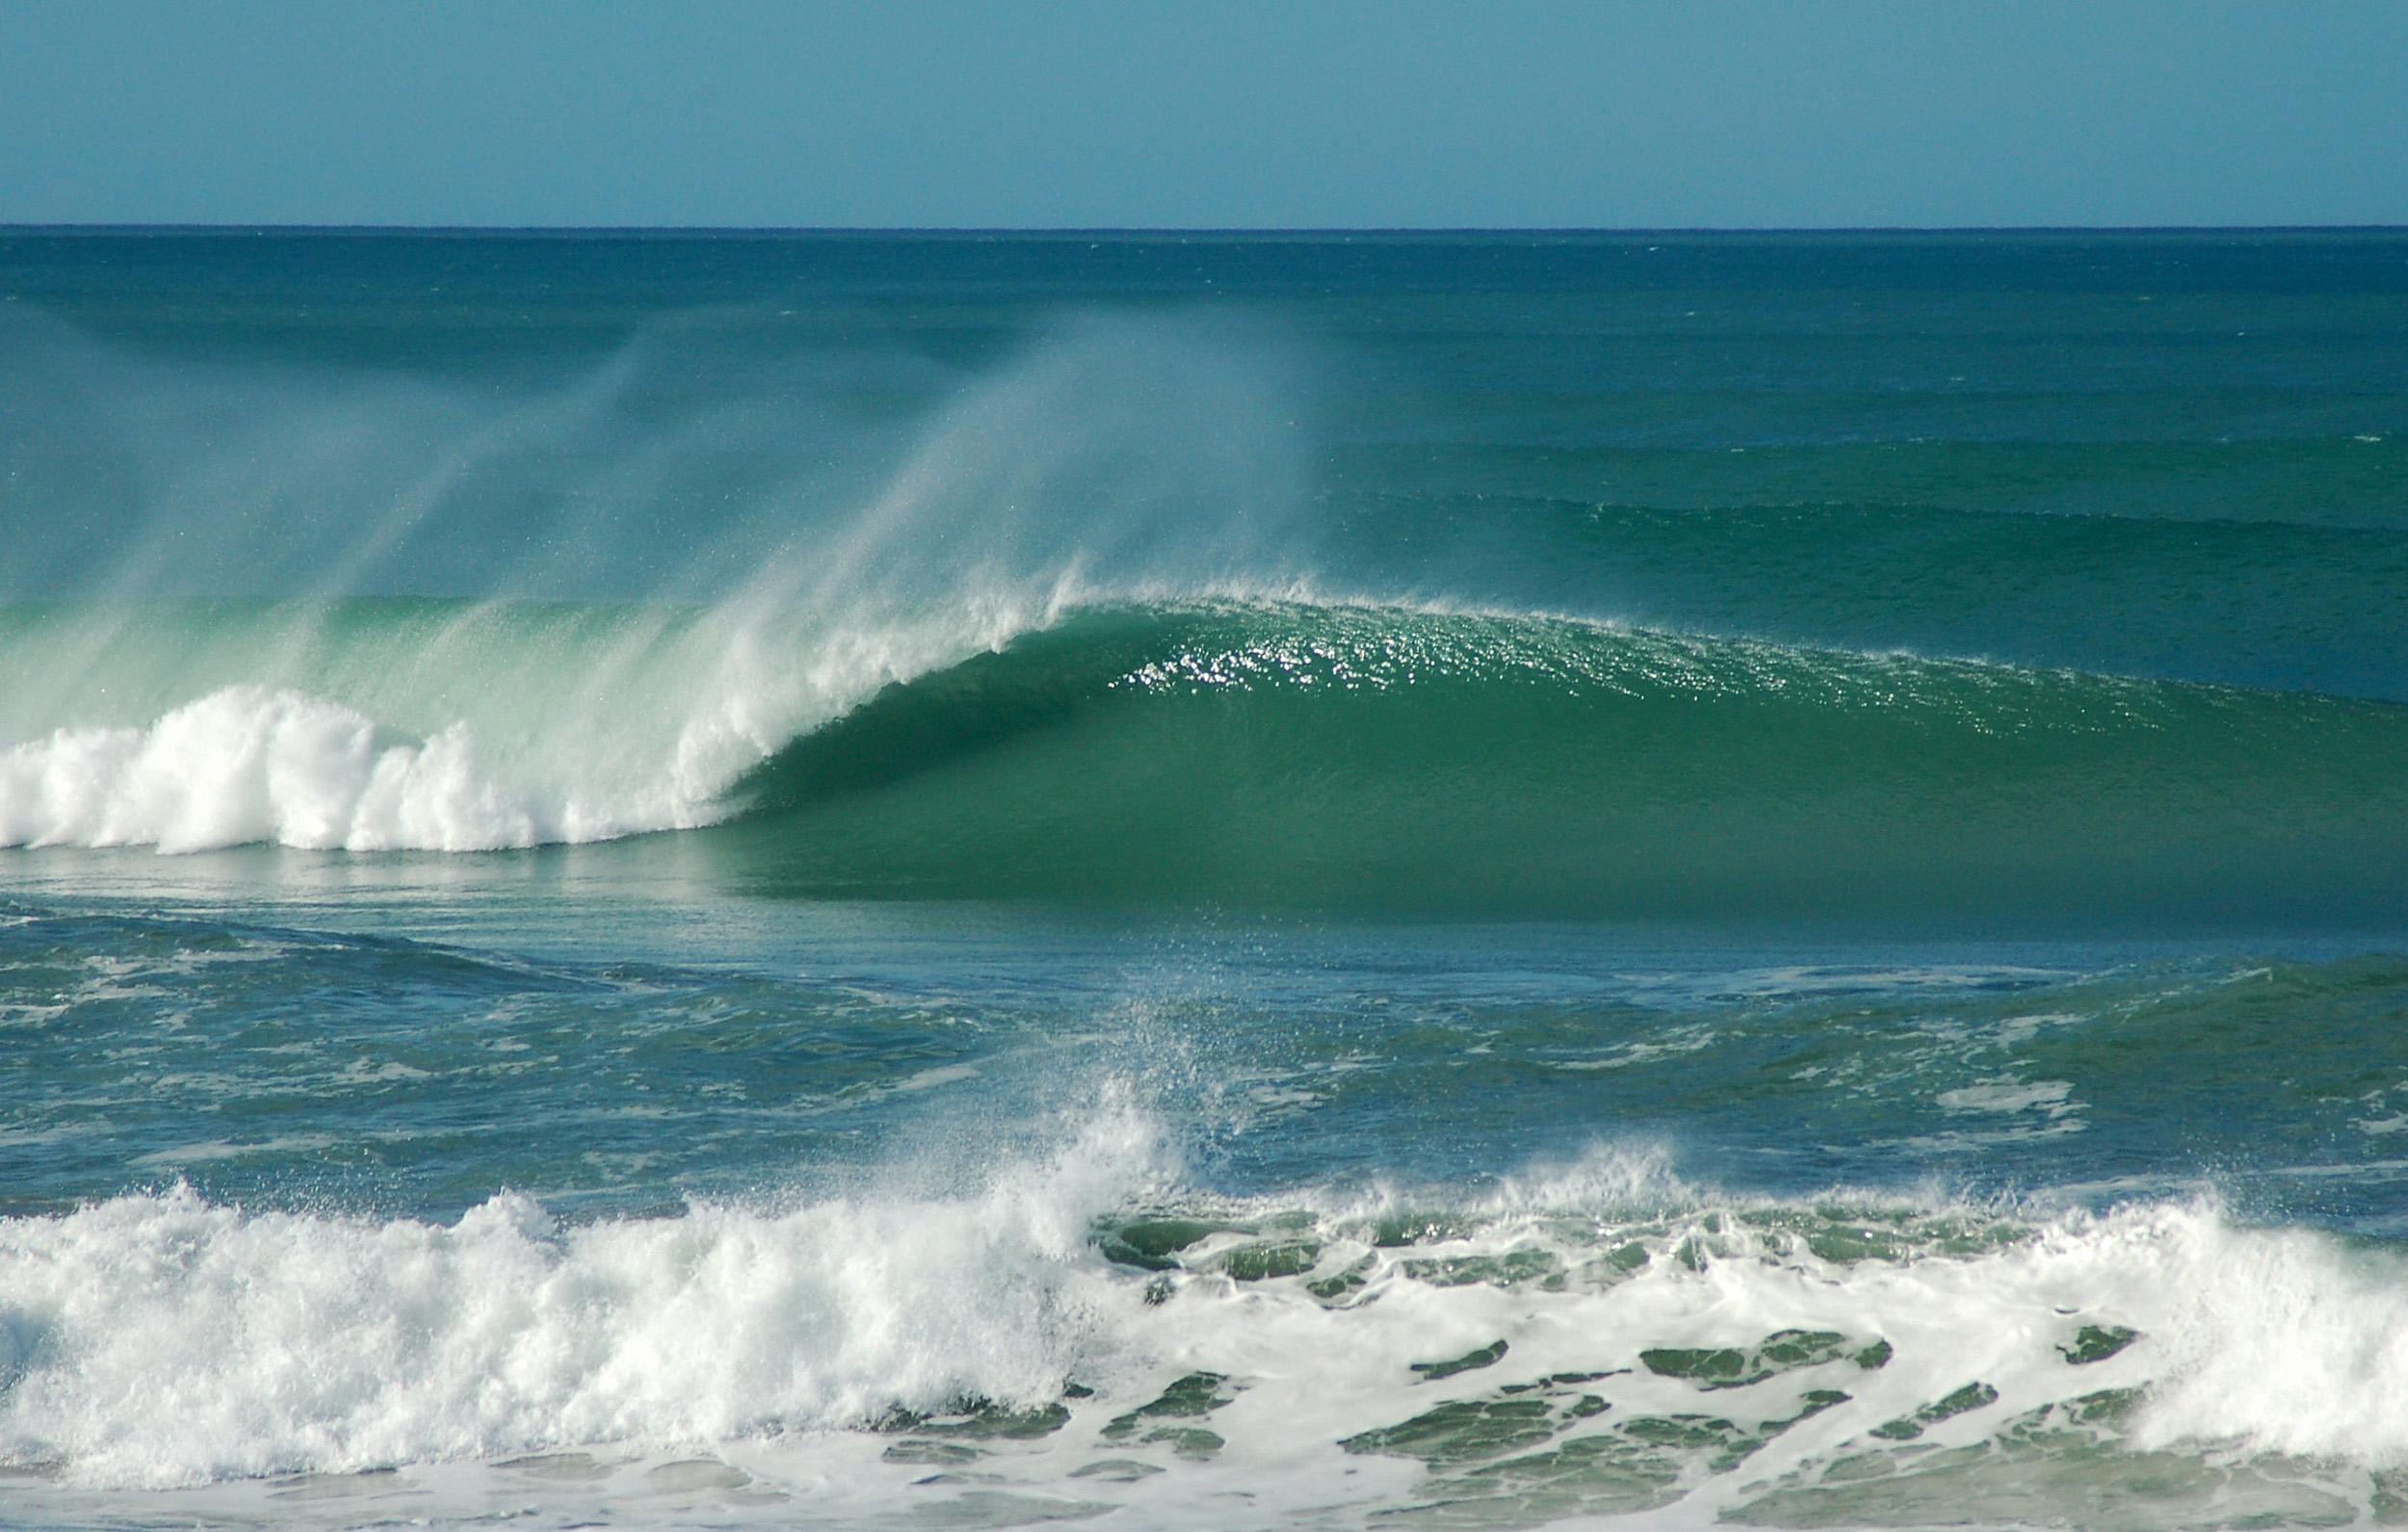 Christian-Surfers-New-Zealand-1.jpg